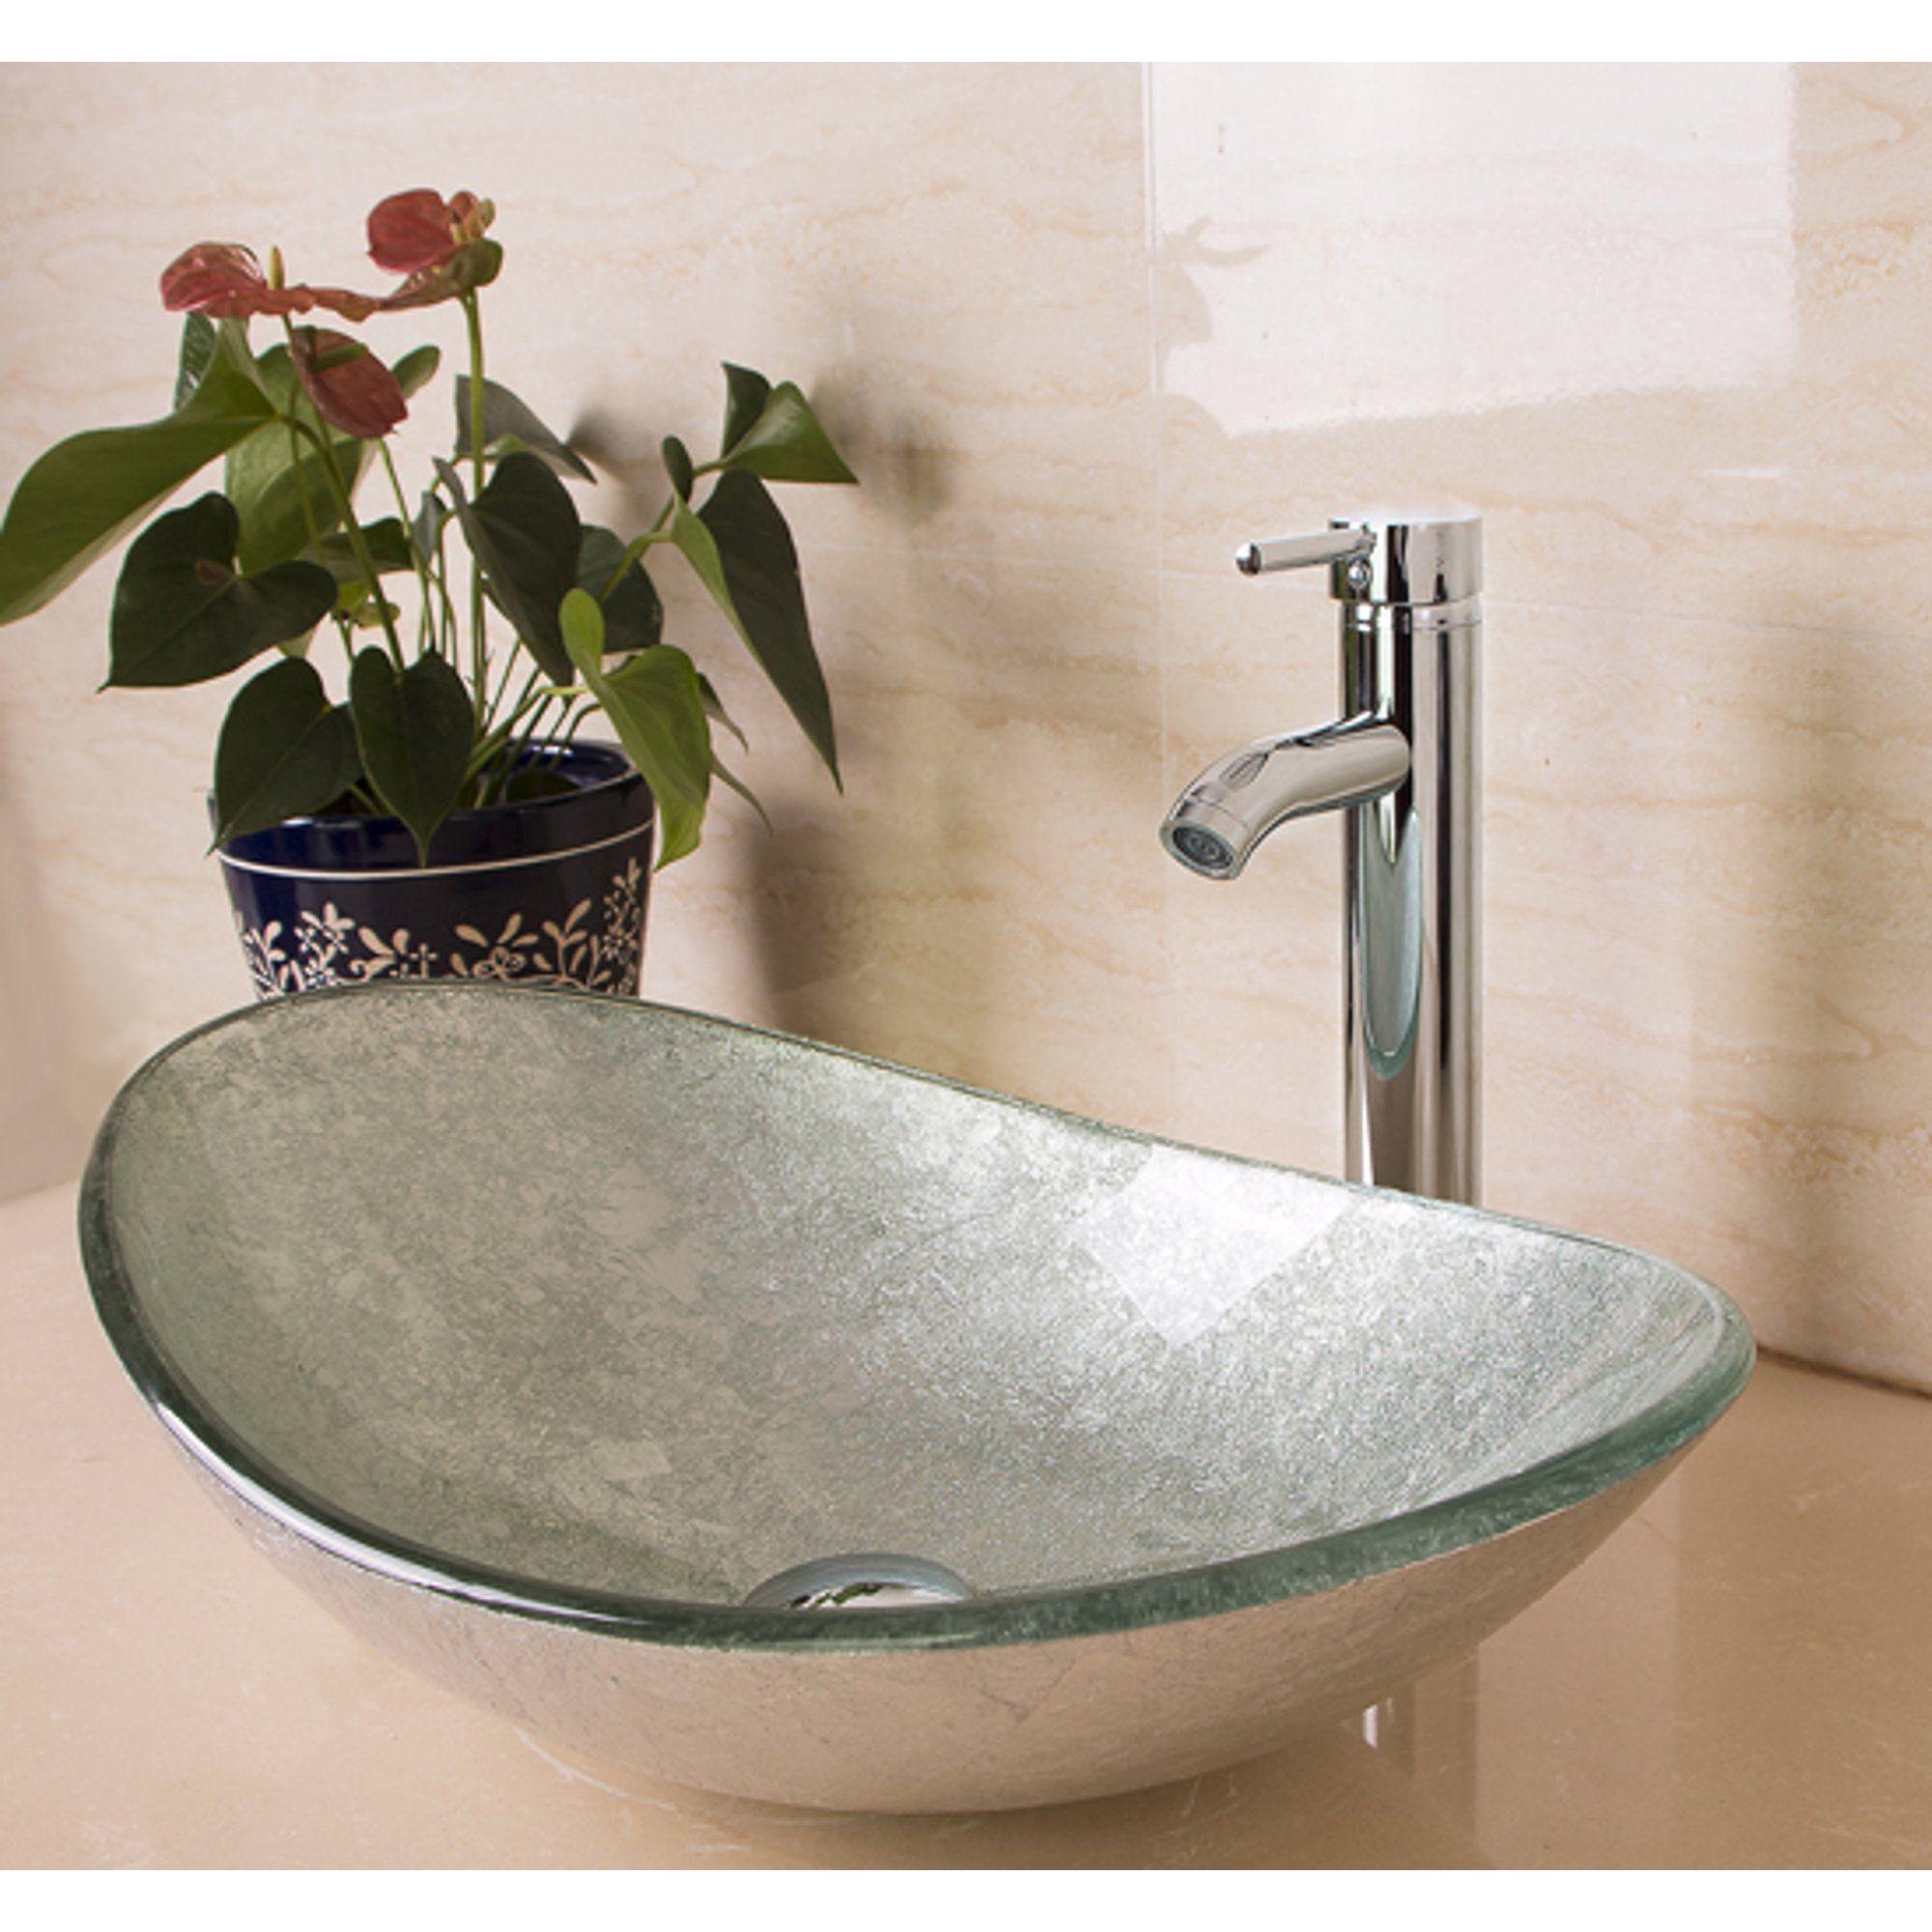 Walcut Bathroom Vanity Art Oval Glass Vessel Sink Basin Faucet Popup Drain Combo New Walmart Com Bathroom Sink Bowls Glass Vessel Sinks Glass Sink [ 2000 x 2000 Pixel ]